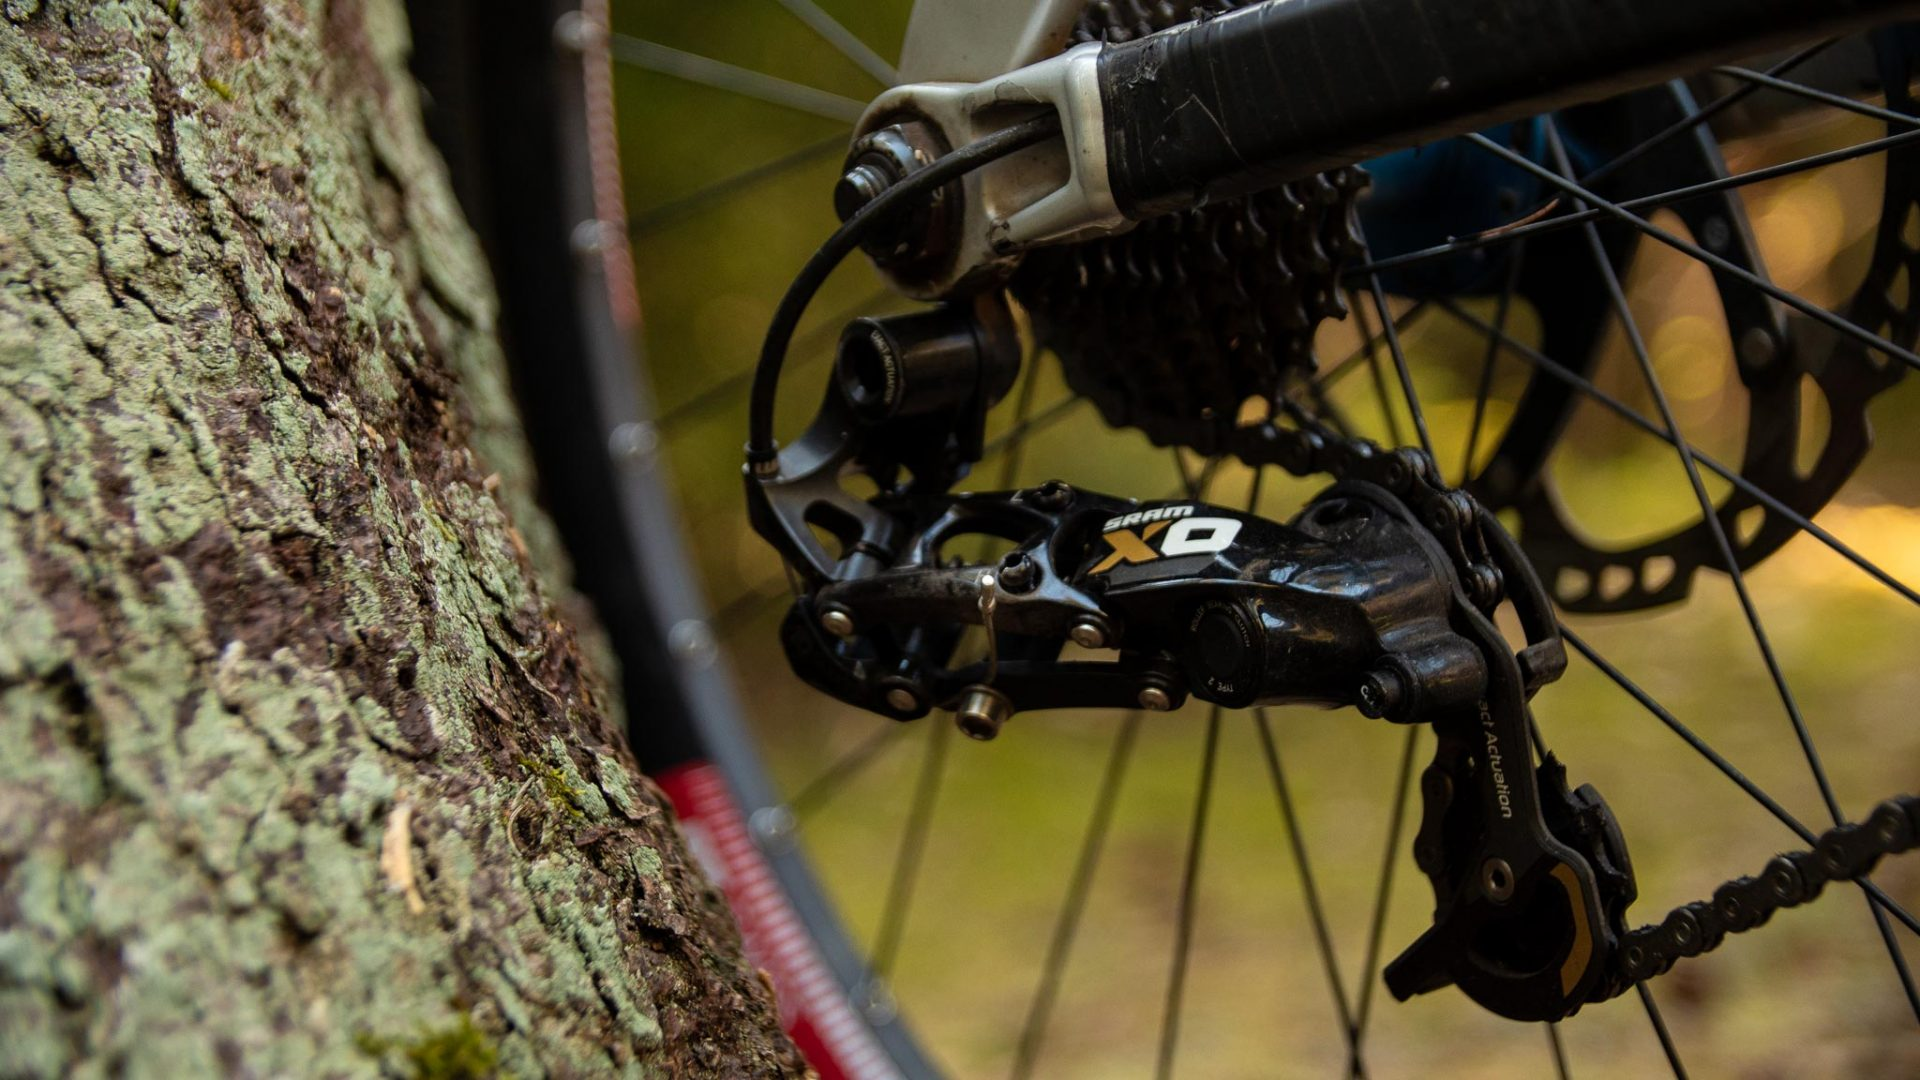 Teambike 2020 Thilo Egert Trek session 9.9 biking is awesome